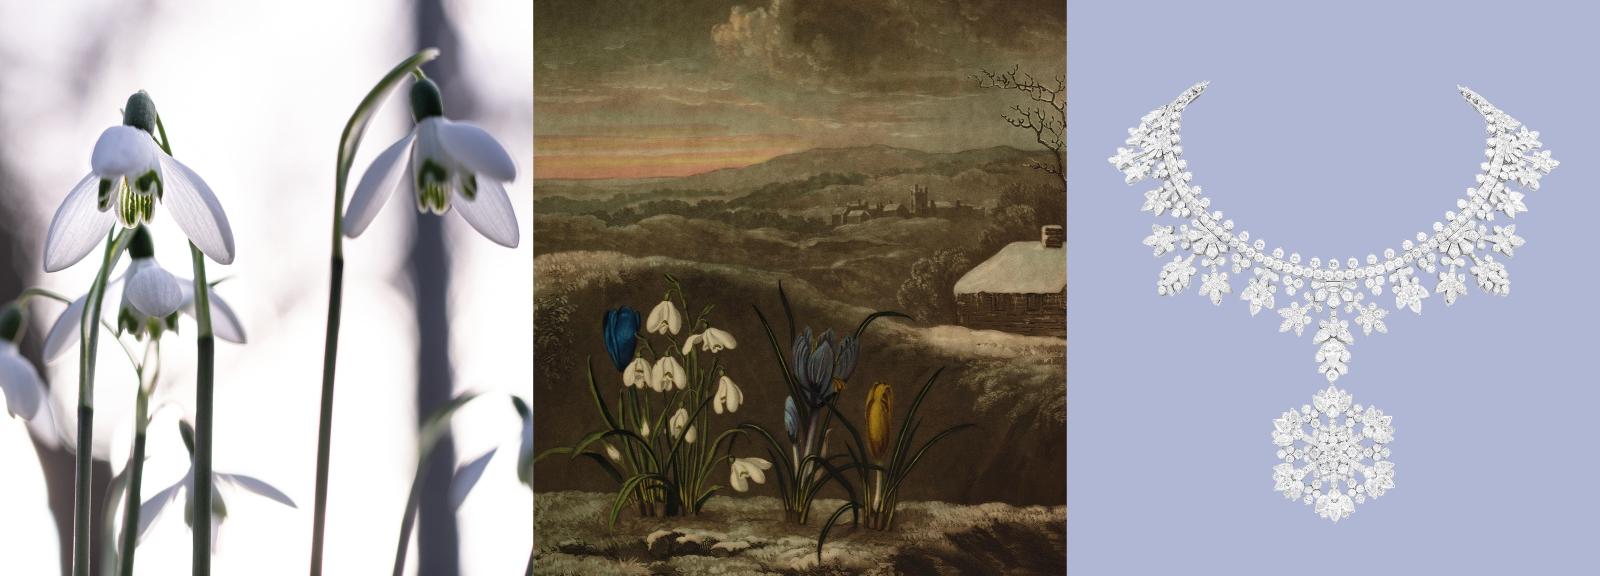 Calendrier floral - Janvier : les perce-neige © MNHN / Collection Van Cleef & Arpels